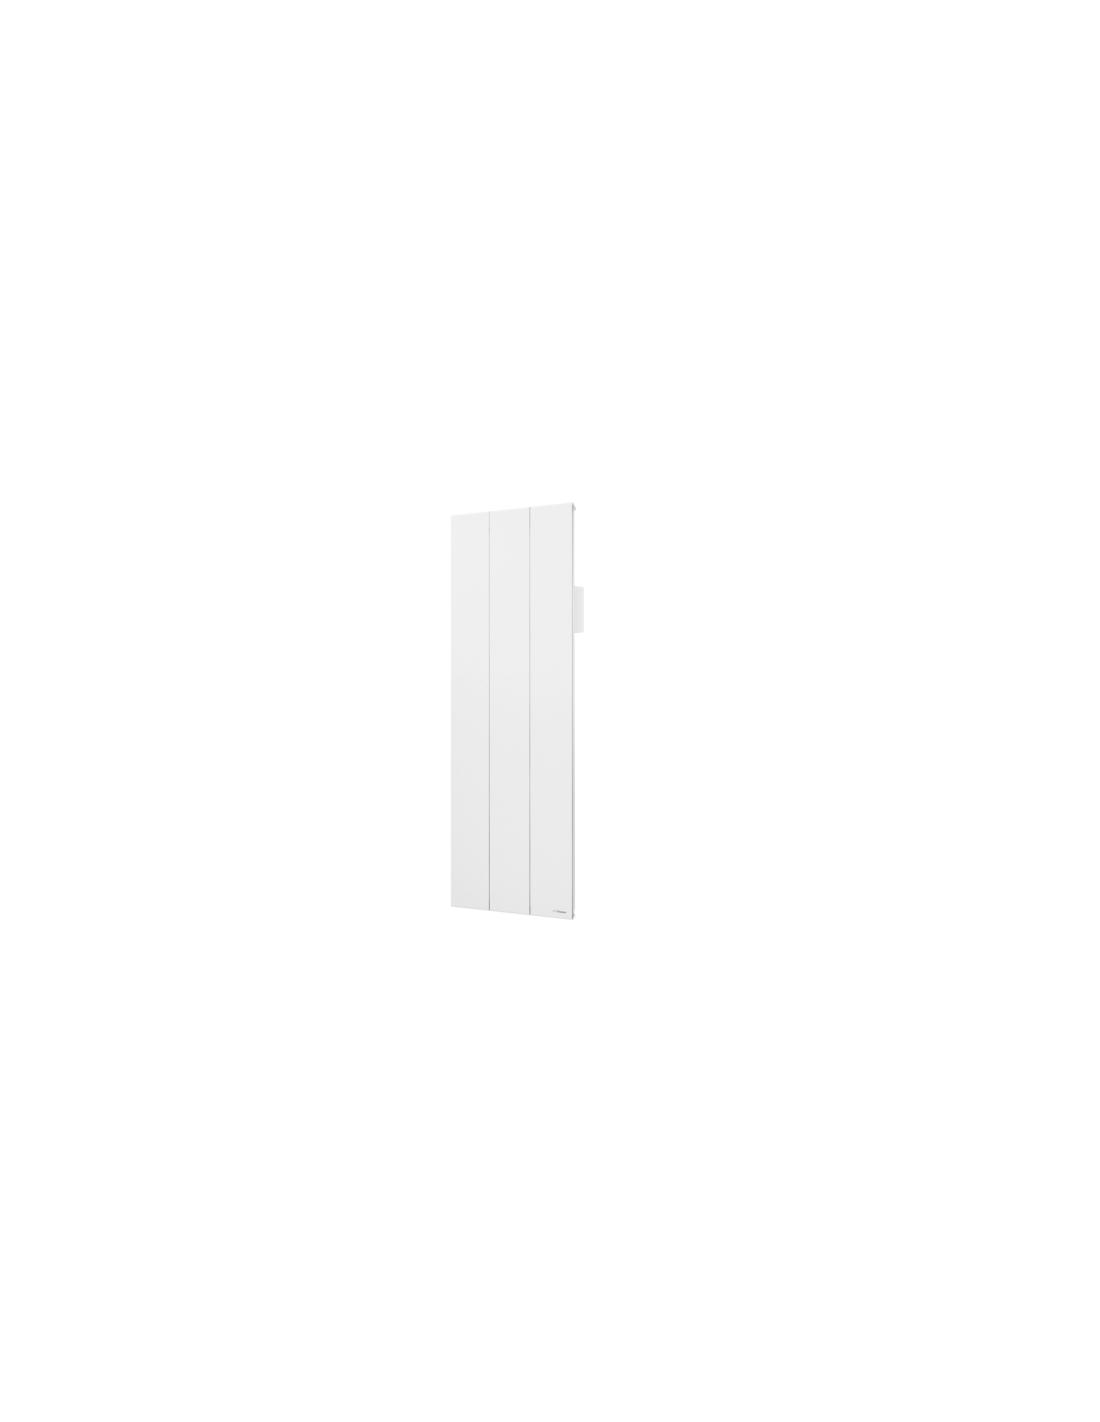 radiateur inertie kenya 3 vertical blanc. Black Bedroom Furniture Sets. Home Design Ideas